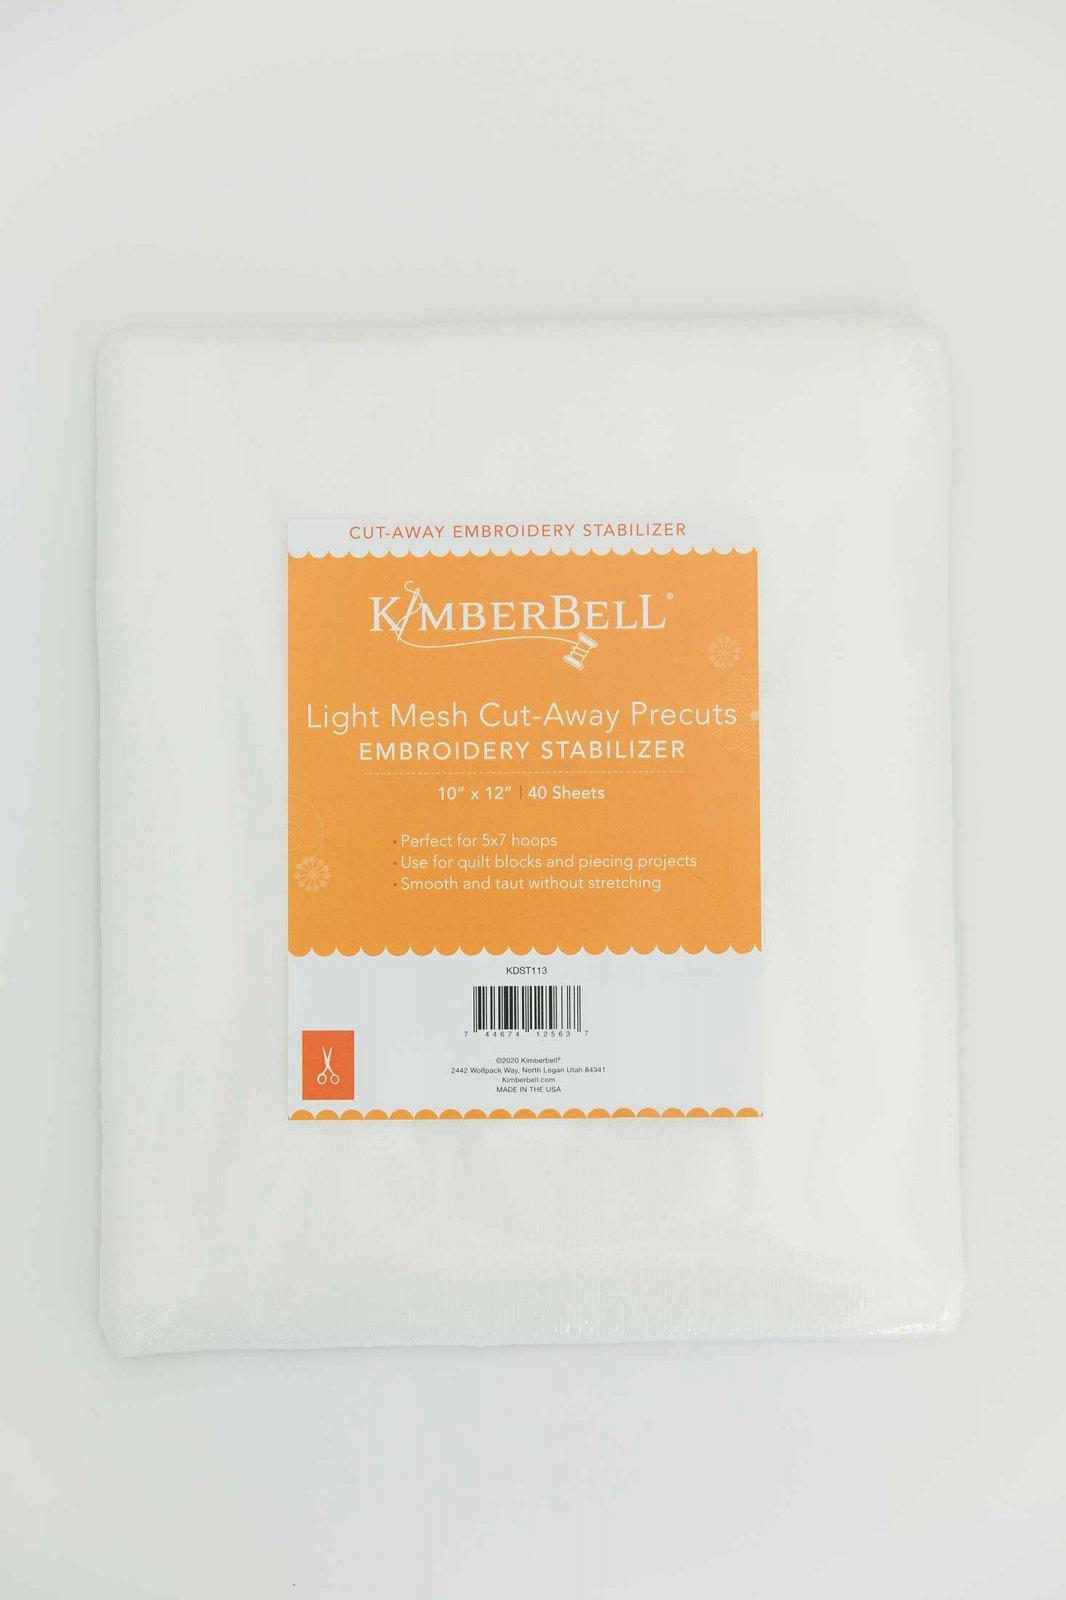 Kimberbell Stabilizer -  Light Mesh Cut-Away 10x12  Precut 40ct